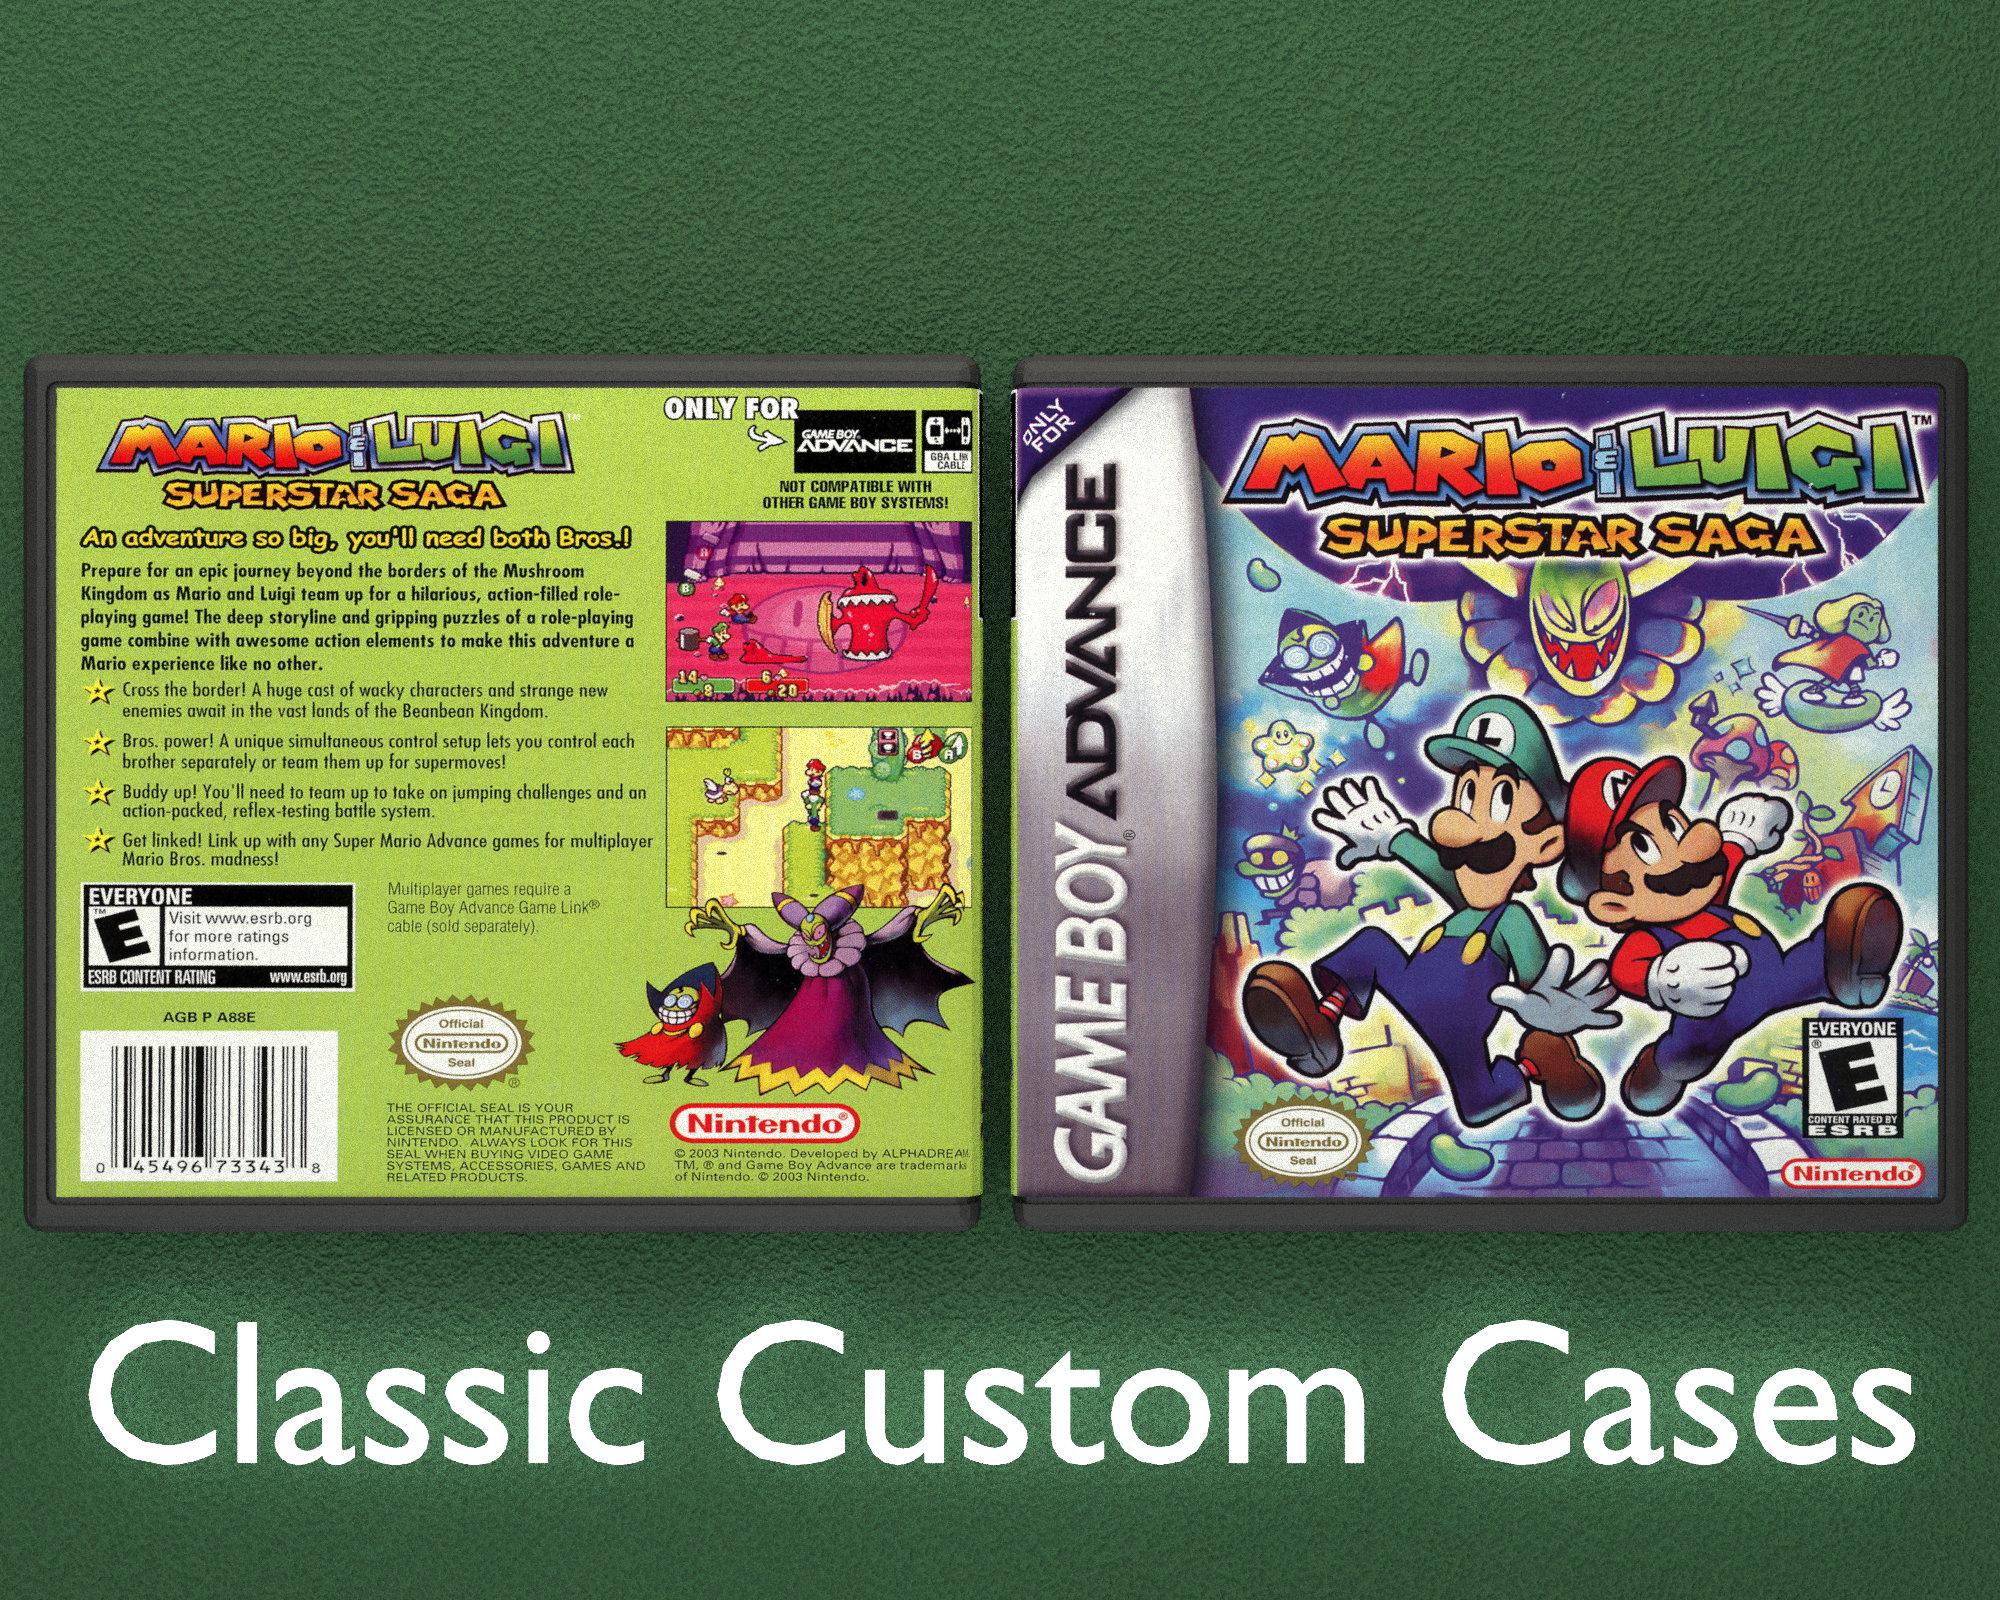 Mario Luigi Superstar Saga Gameboy Advance Custom Case Etsy